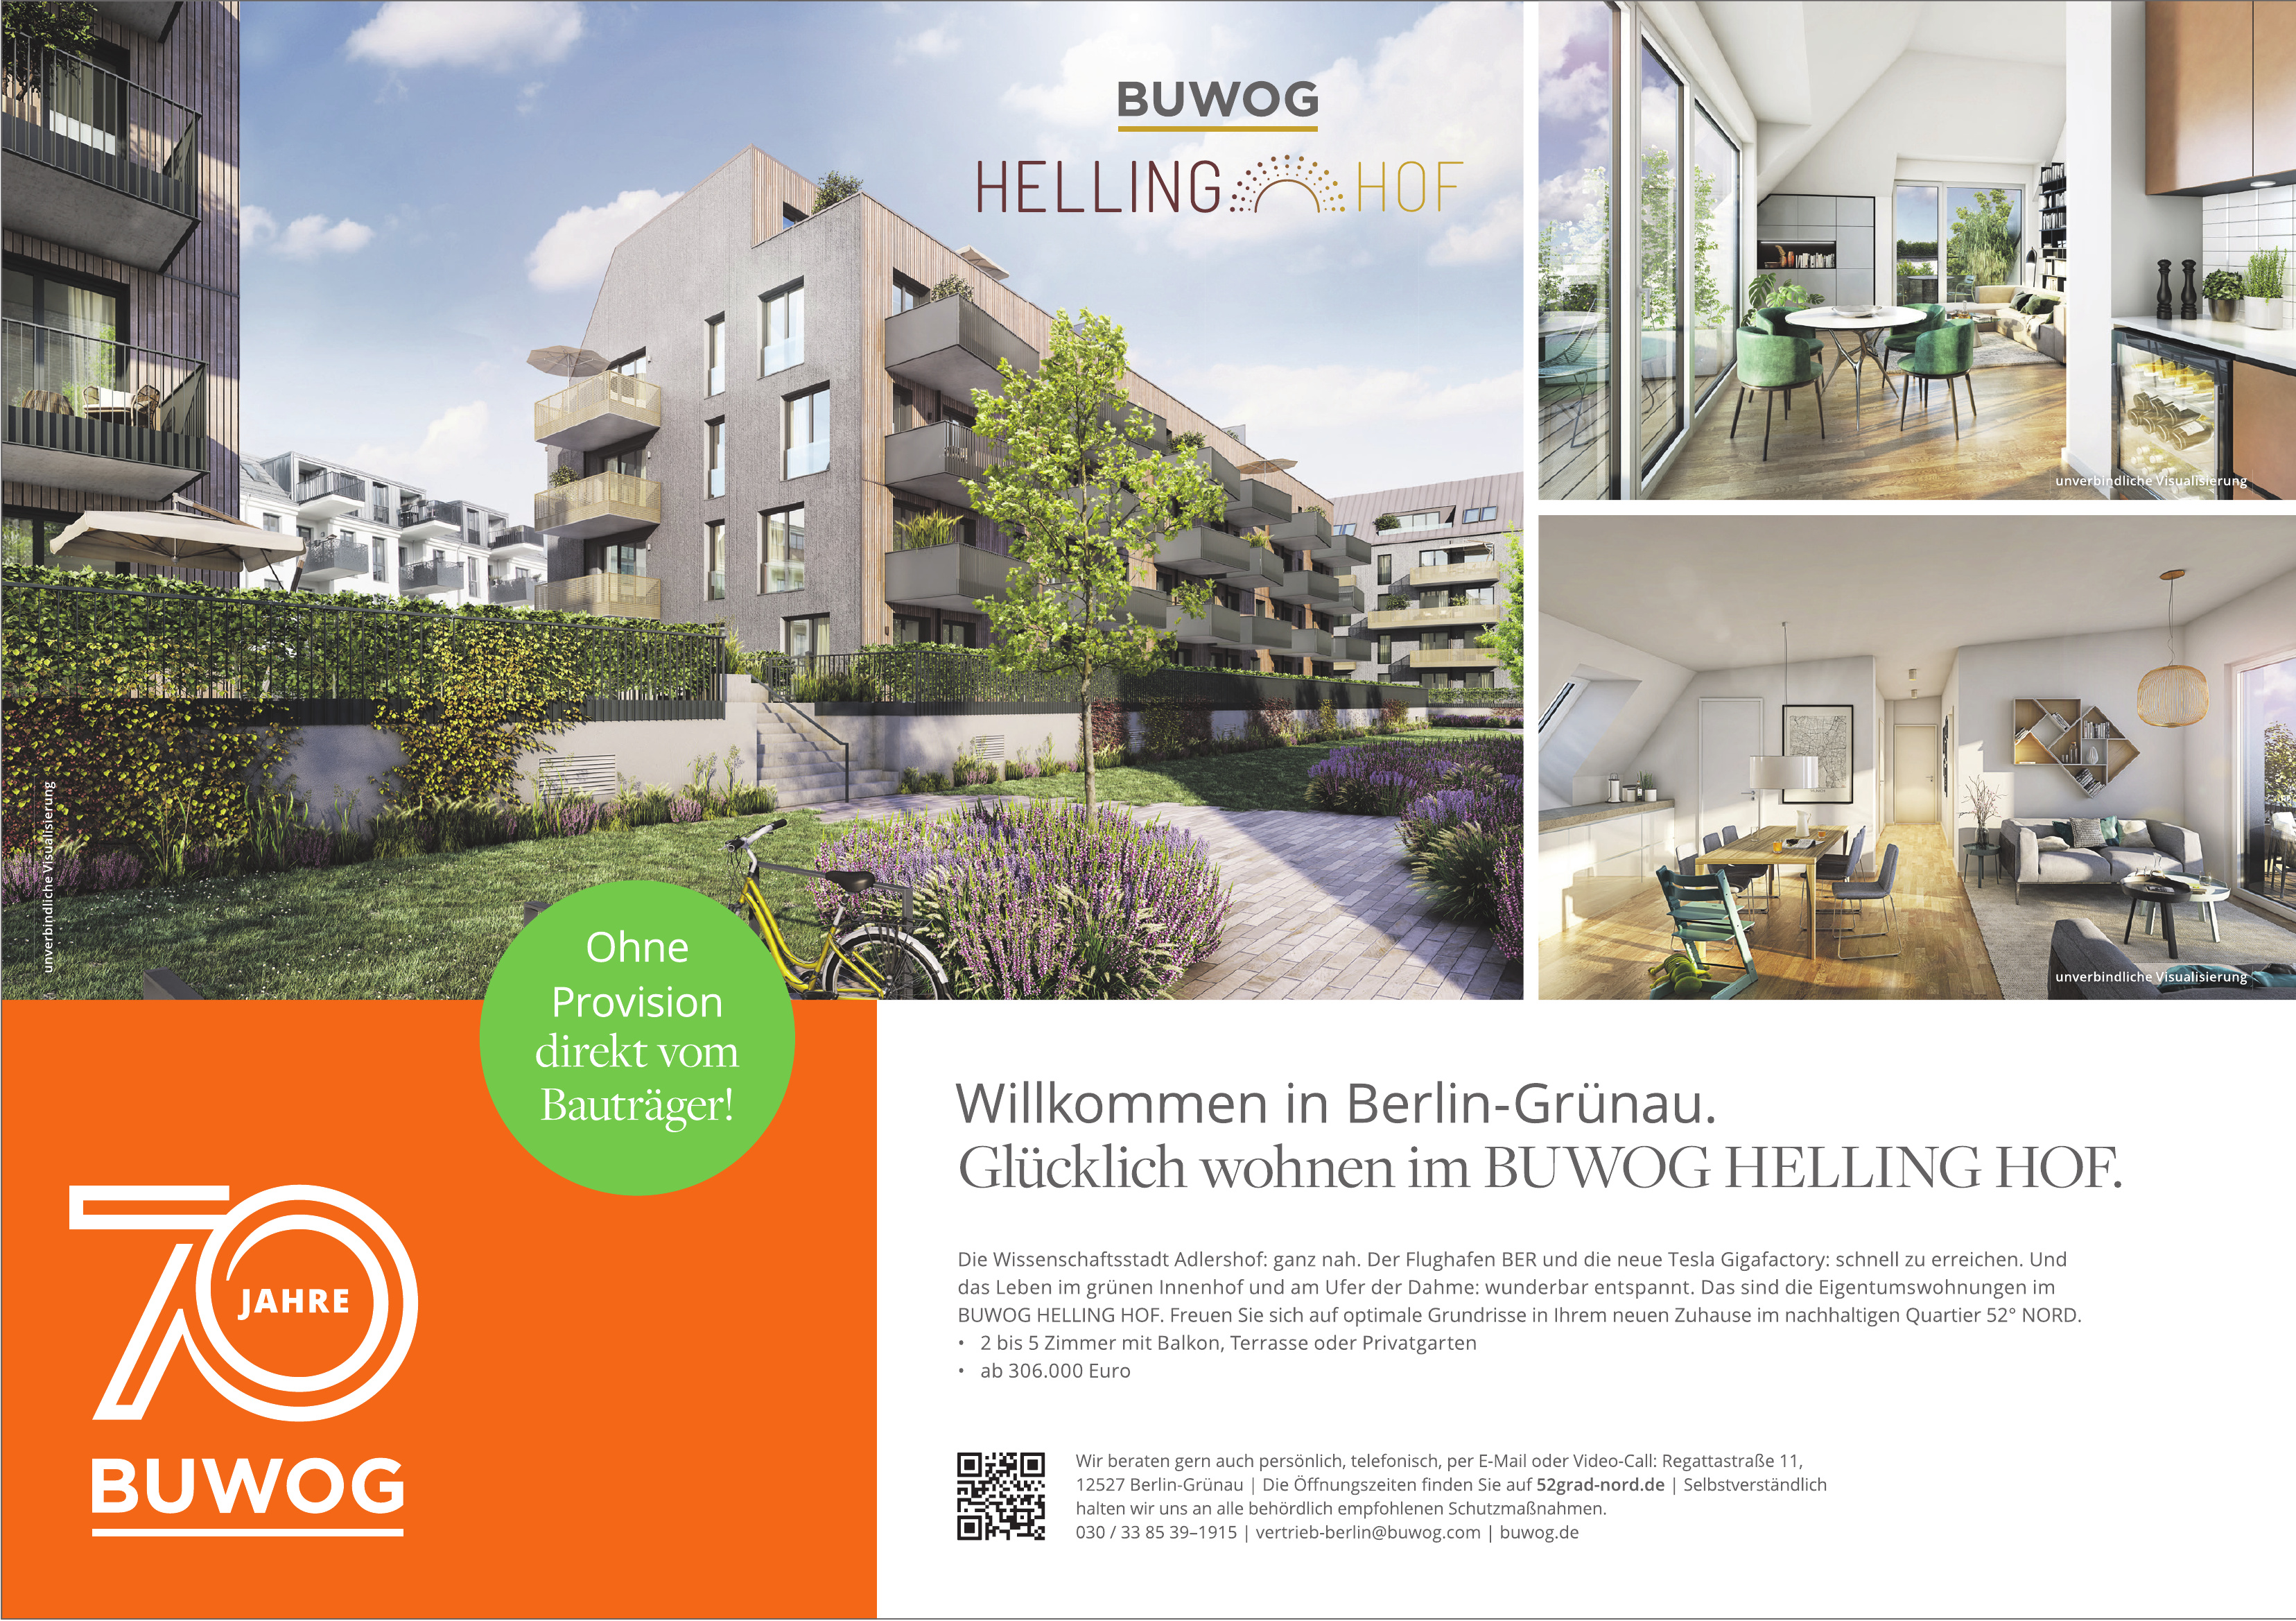 Quartier 52° Nord - BUWOG HELLING HOF